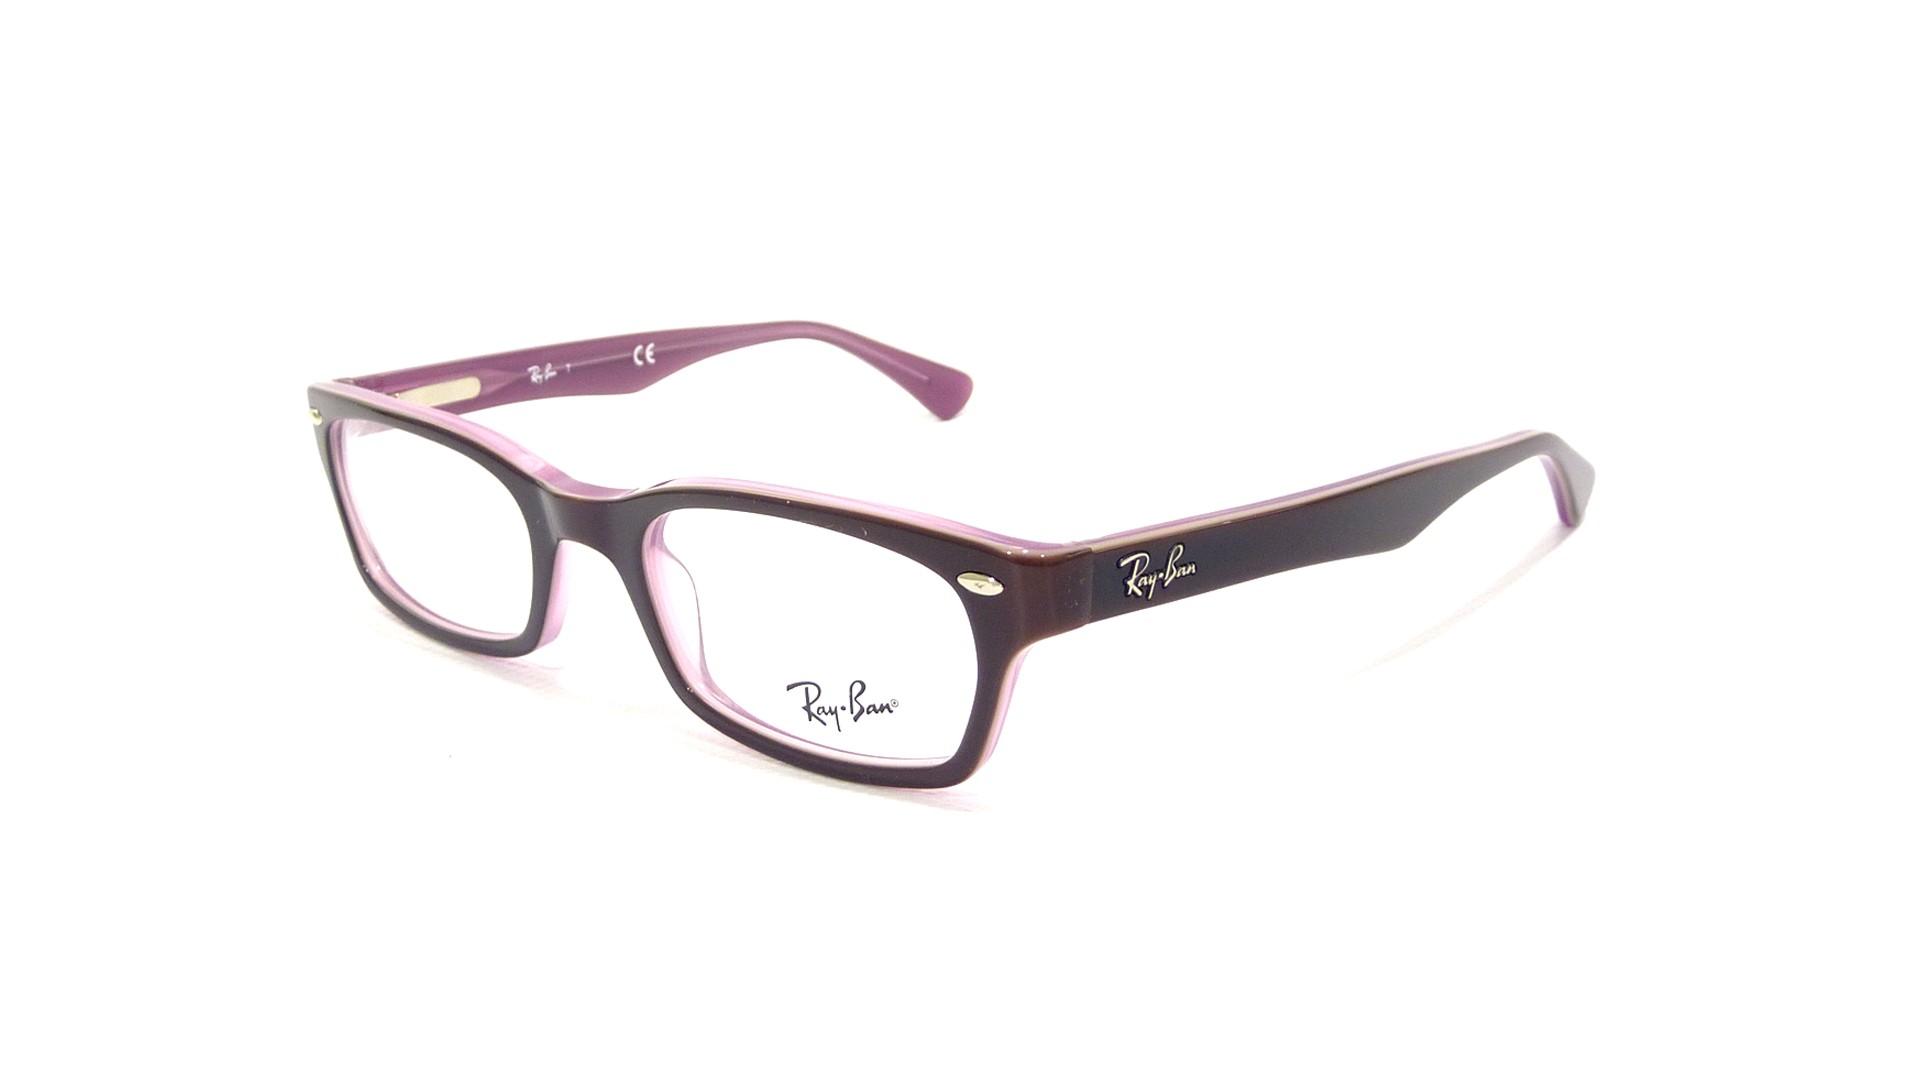 cc14732e893 Ray Ban 5150 Tortoise Pink « Heritage Malta